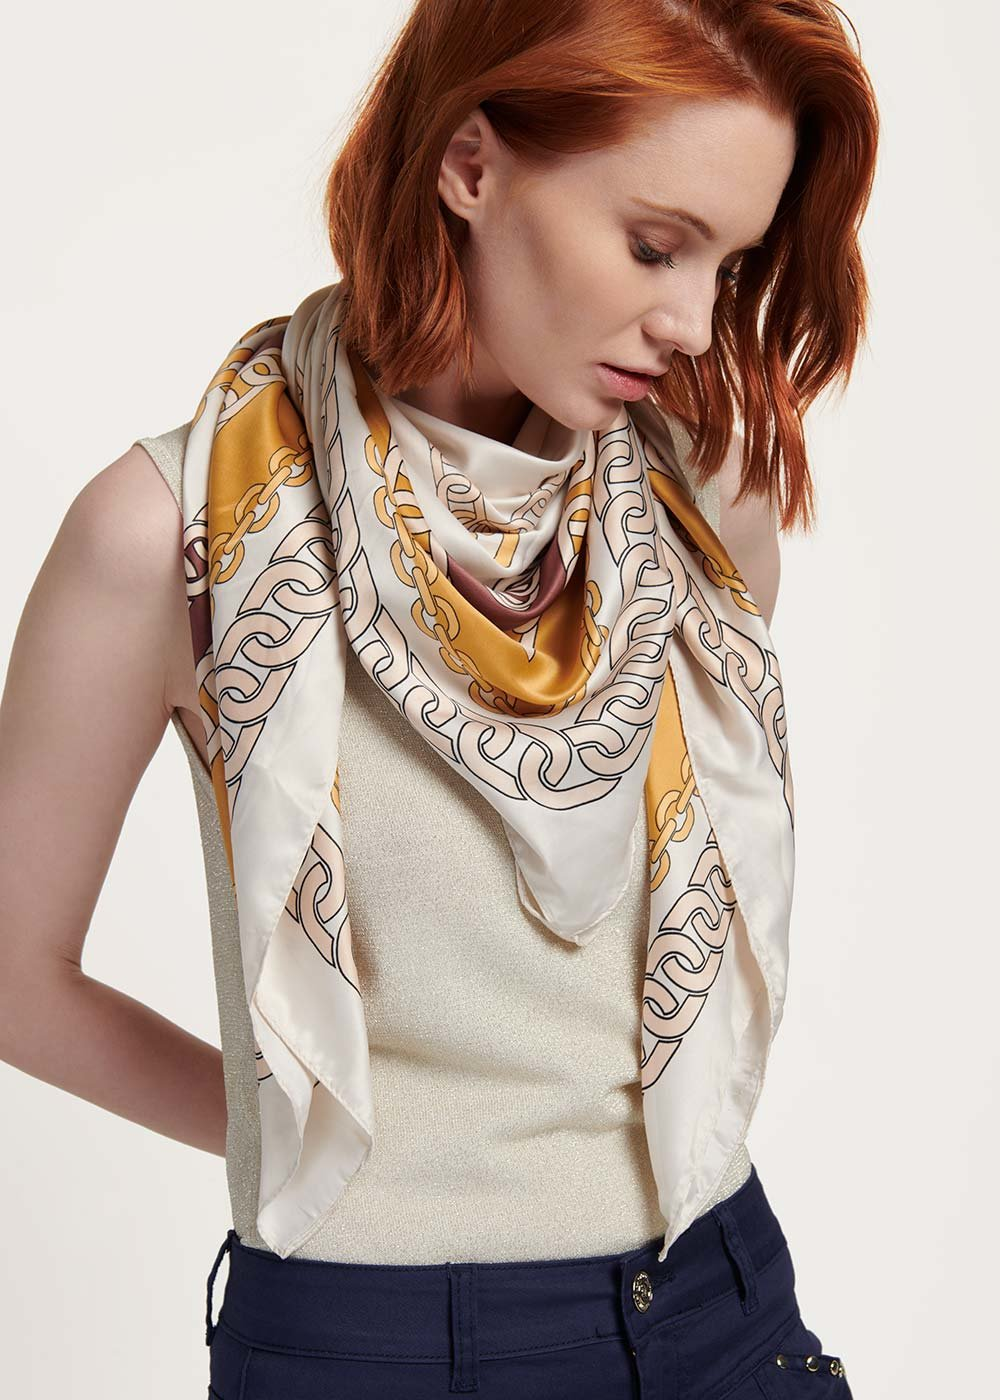 Sheryl patterned headscarf - Cocco Fantasia - Woman